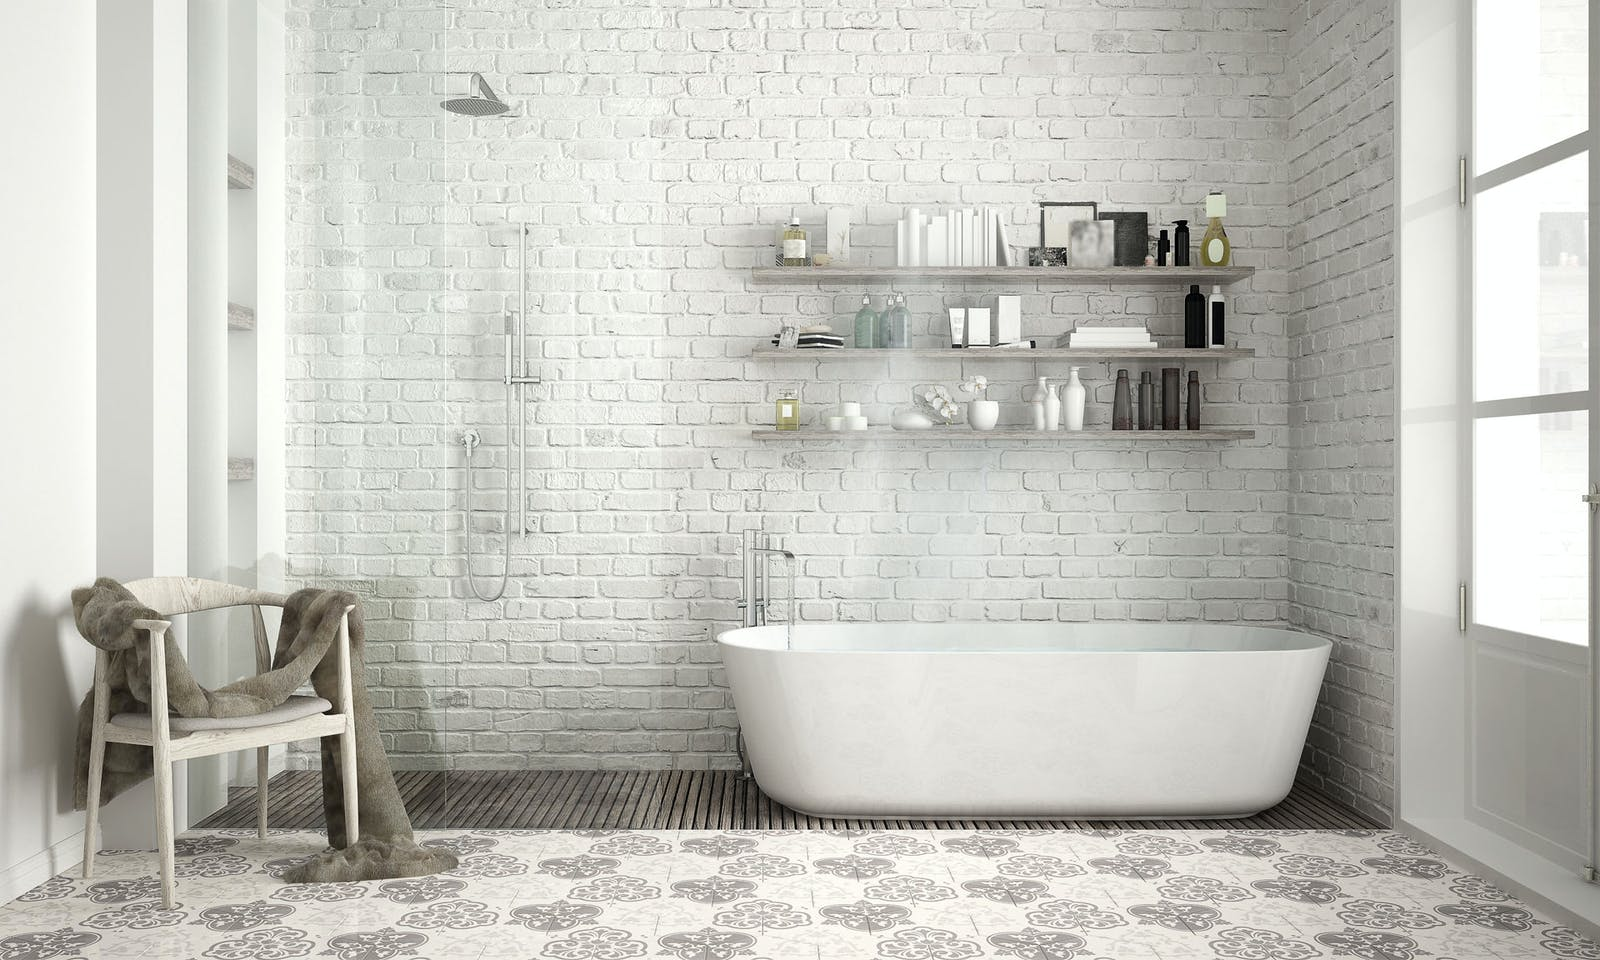 Modern bathroom with a bathtub and white bricks